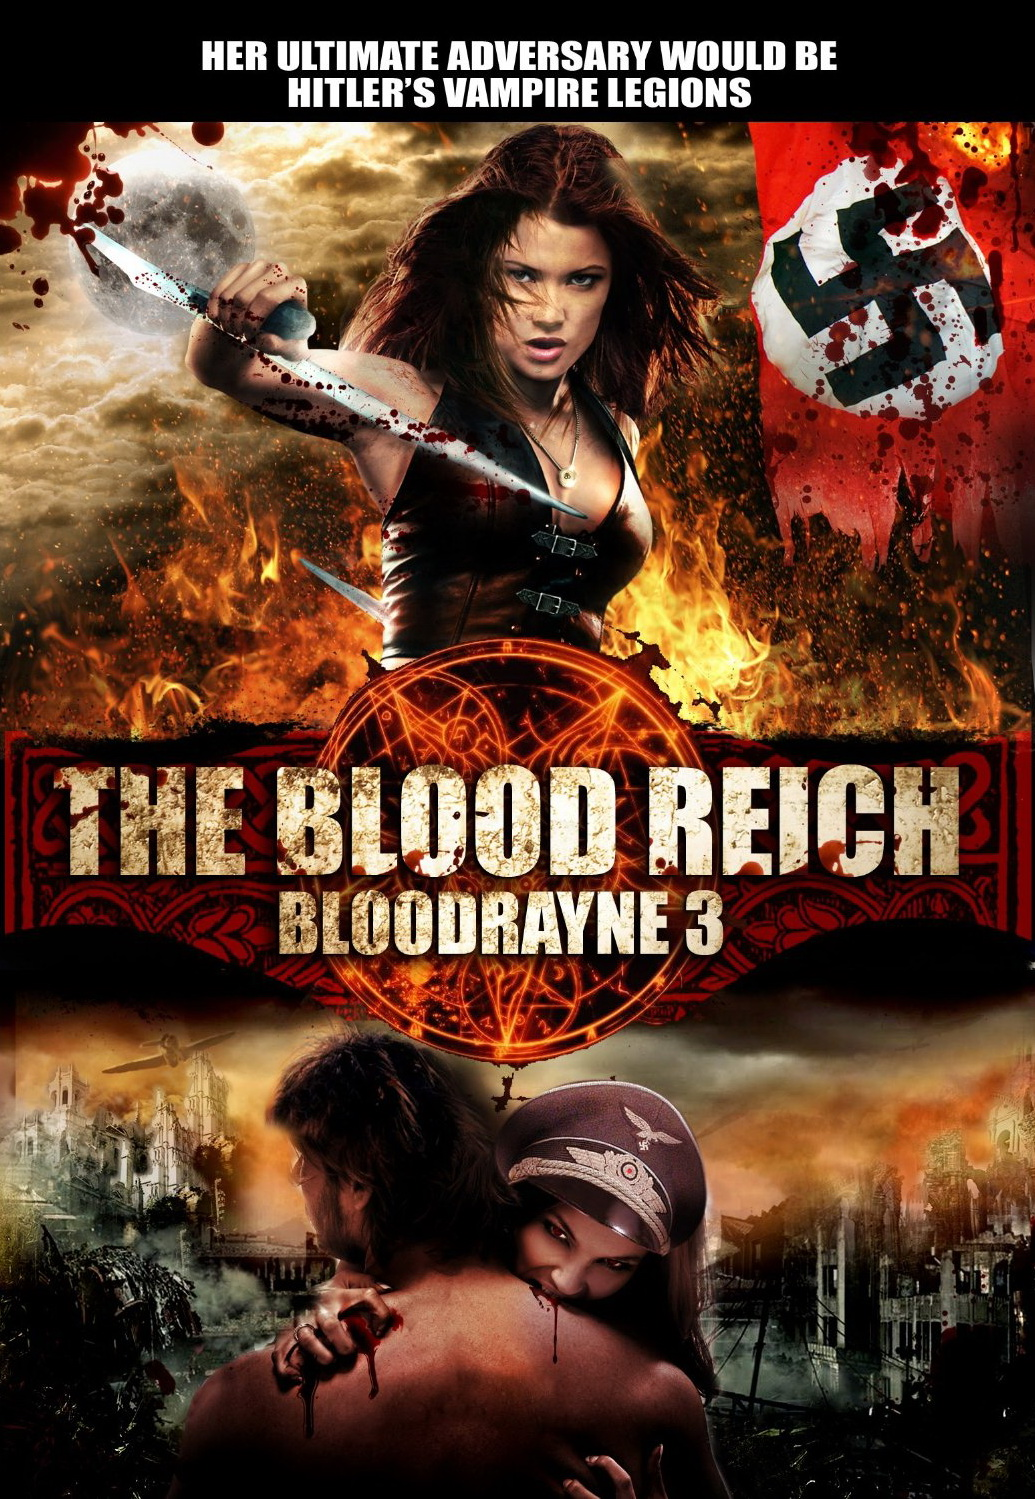 Смотреть онлайн vampyre lovers 2010 dvdrip 24 фотография